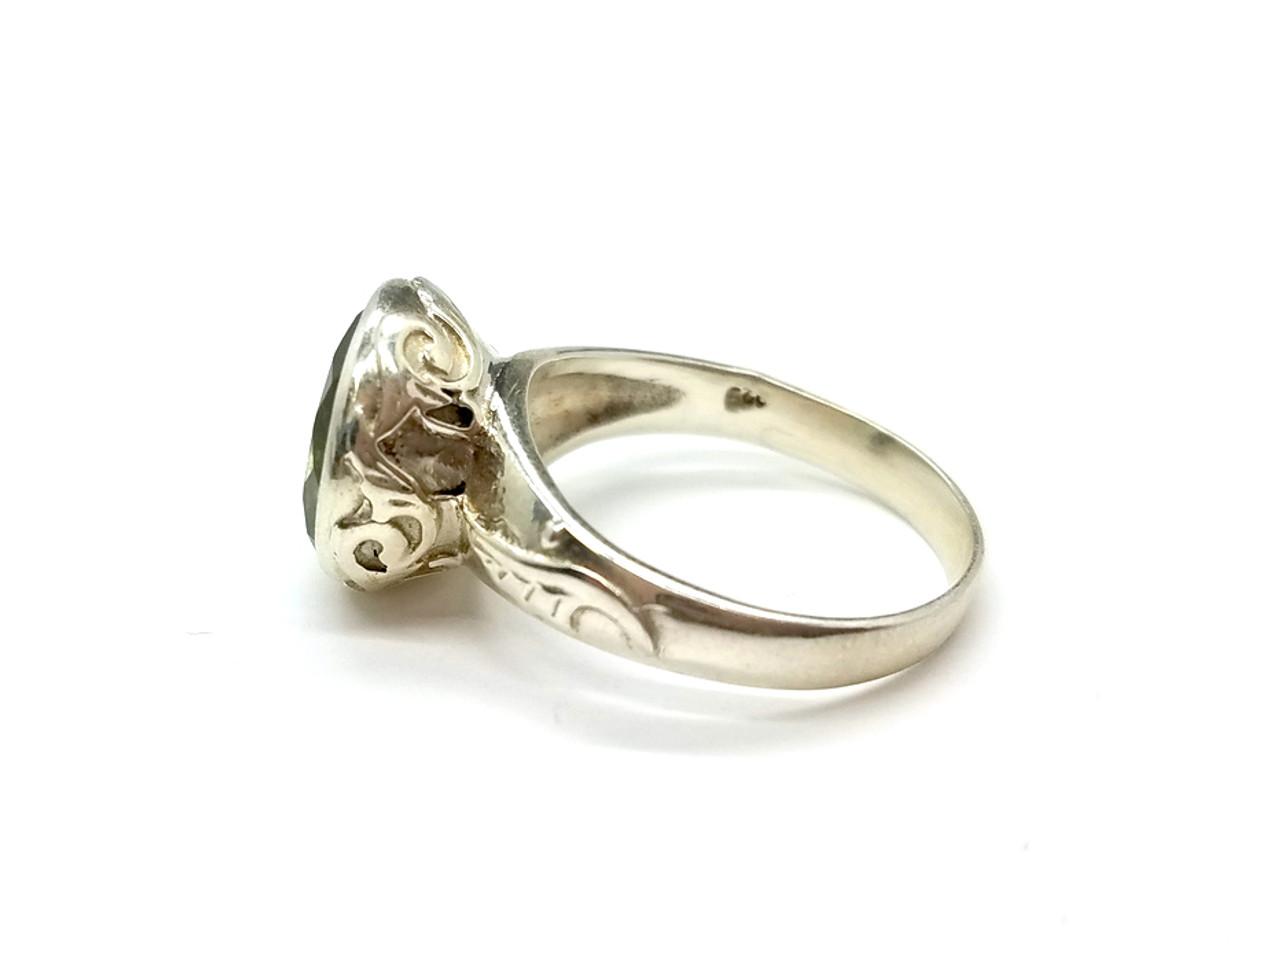 Green Amethyst Sterling Silver Ring